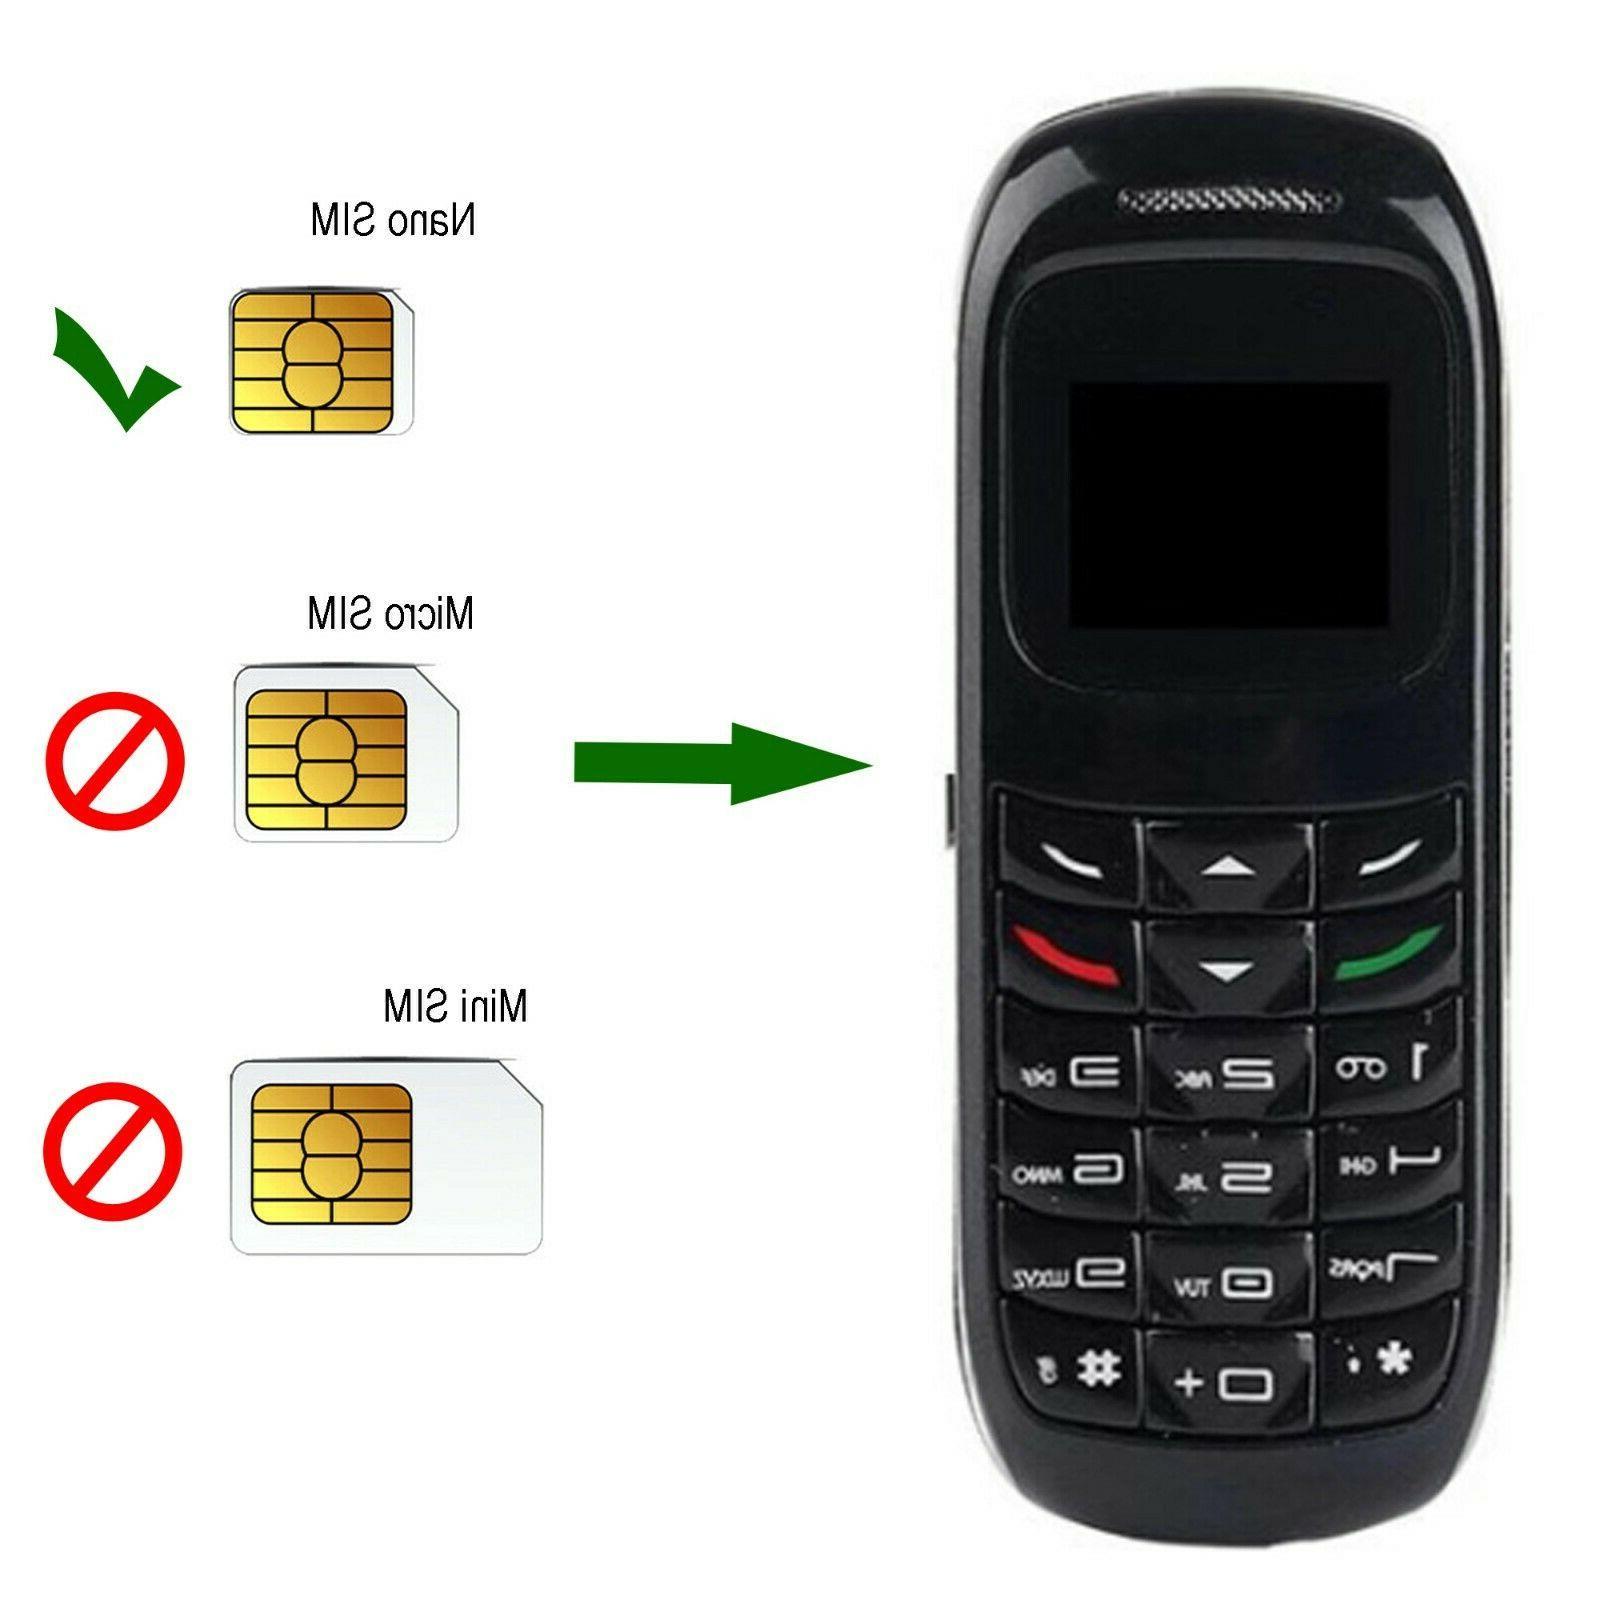 Mini Mobile Phone Dialer Earphone